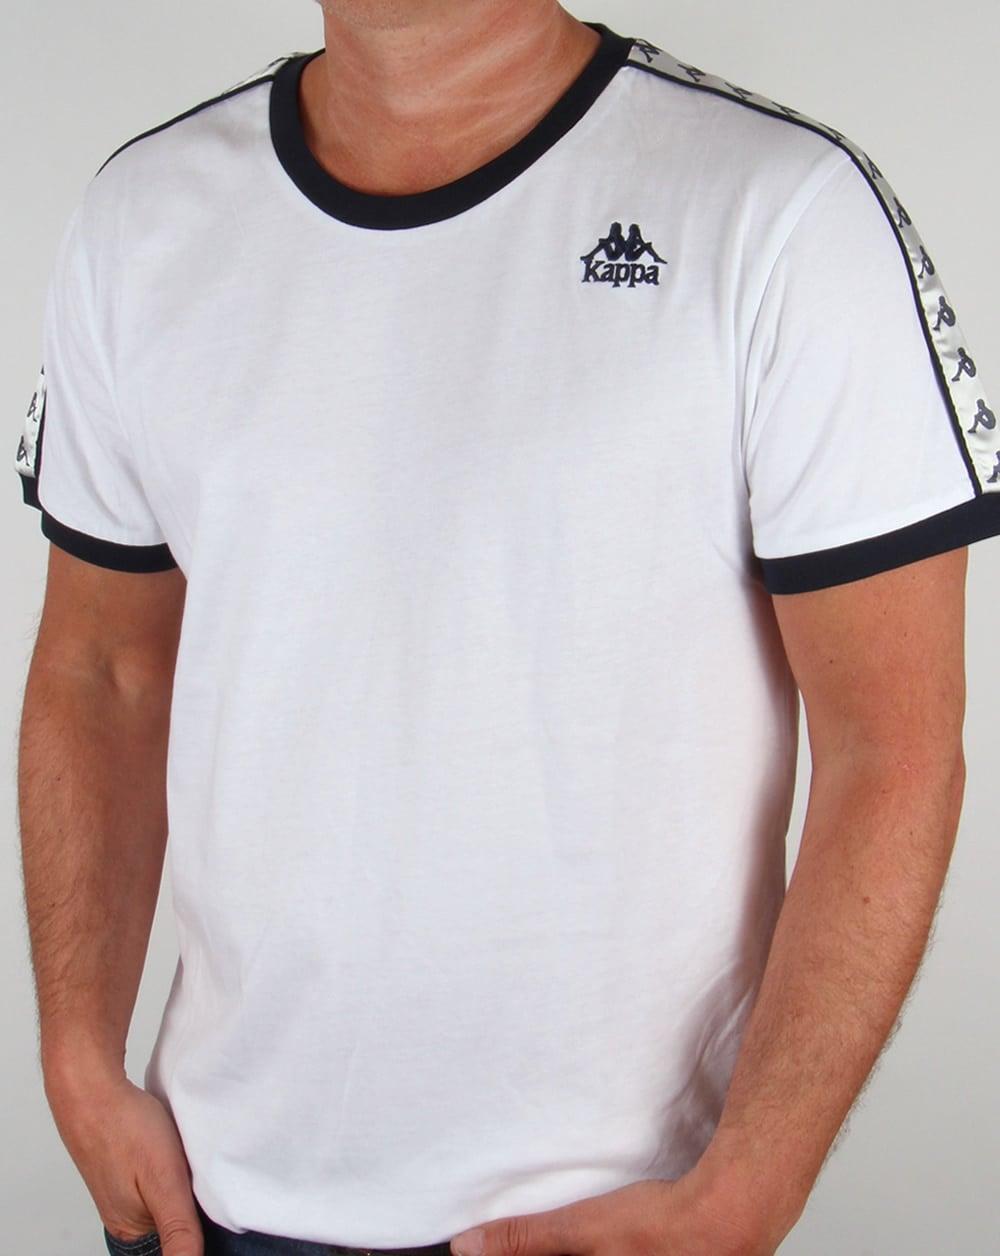 kappa clothing uk